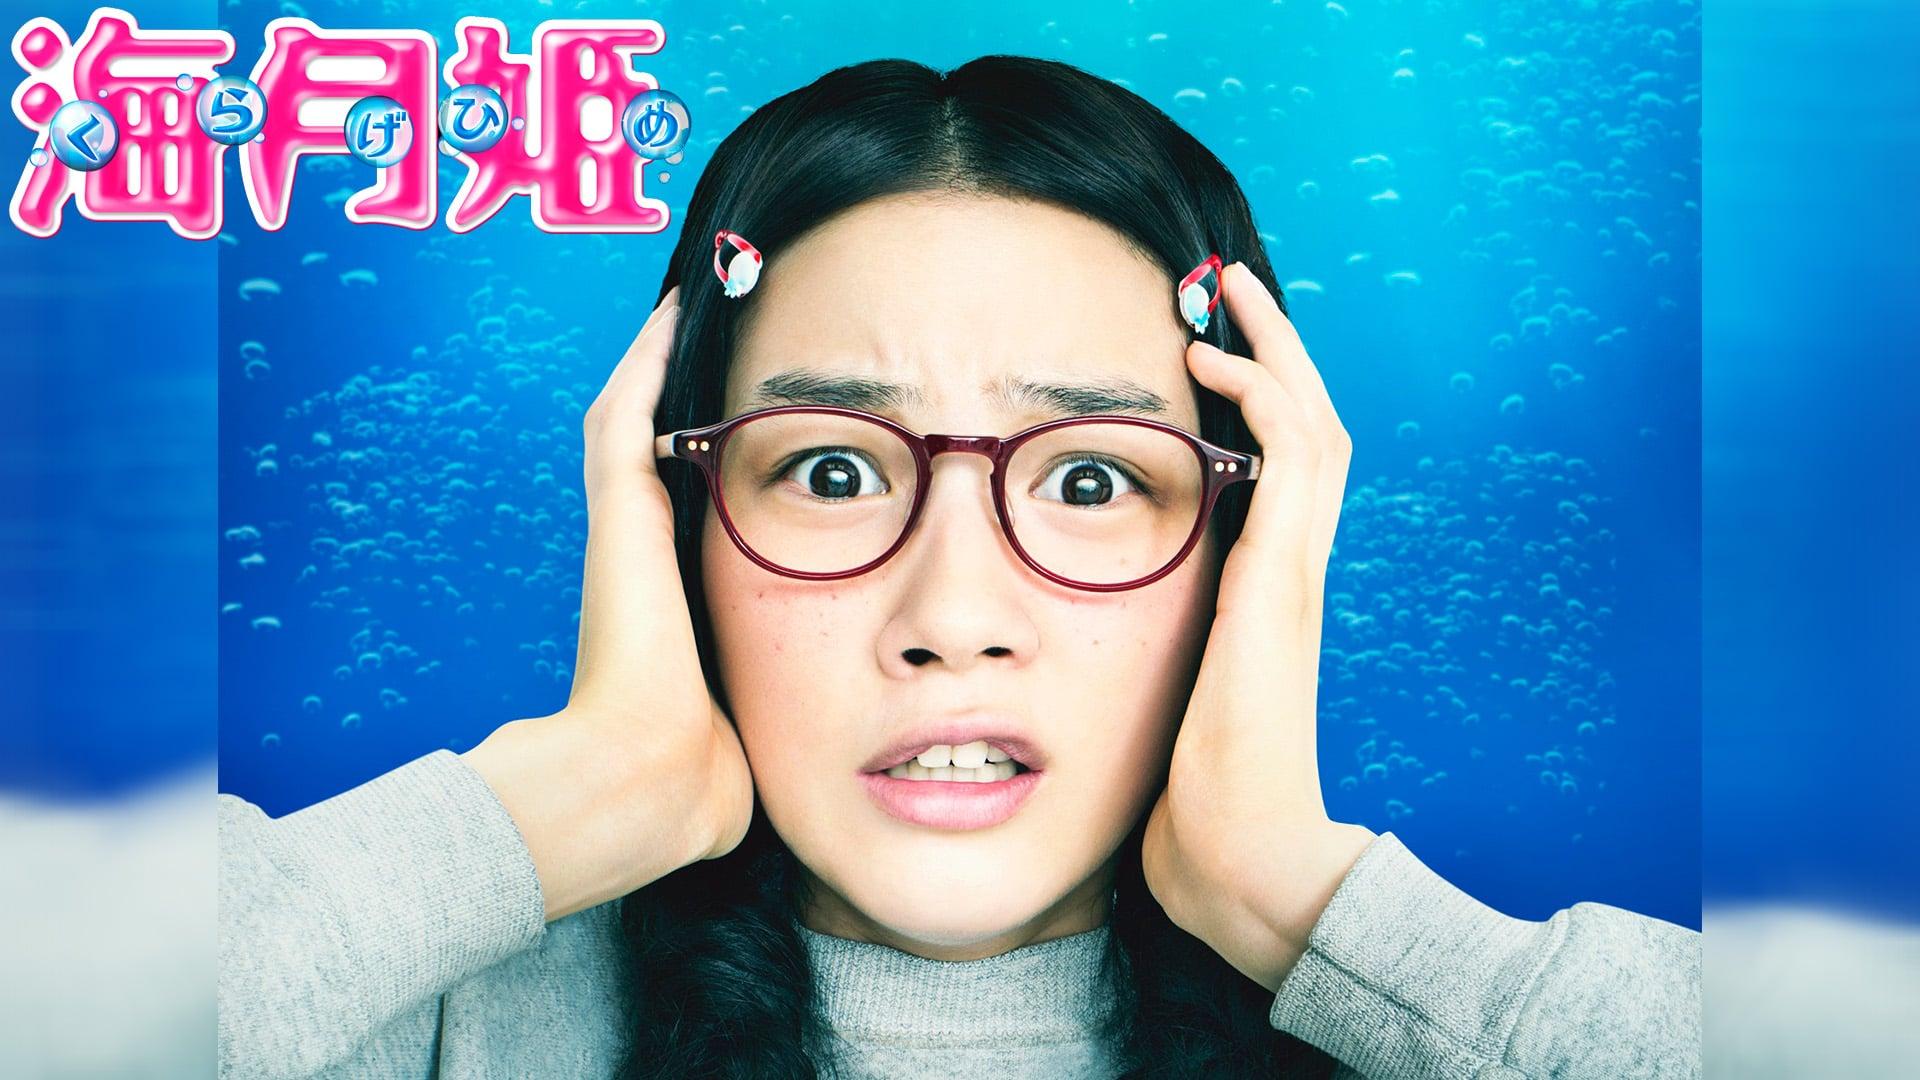 Princess Jellyfish Movie Streaming Online